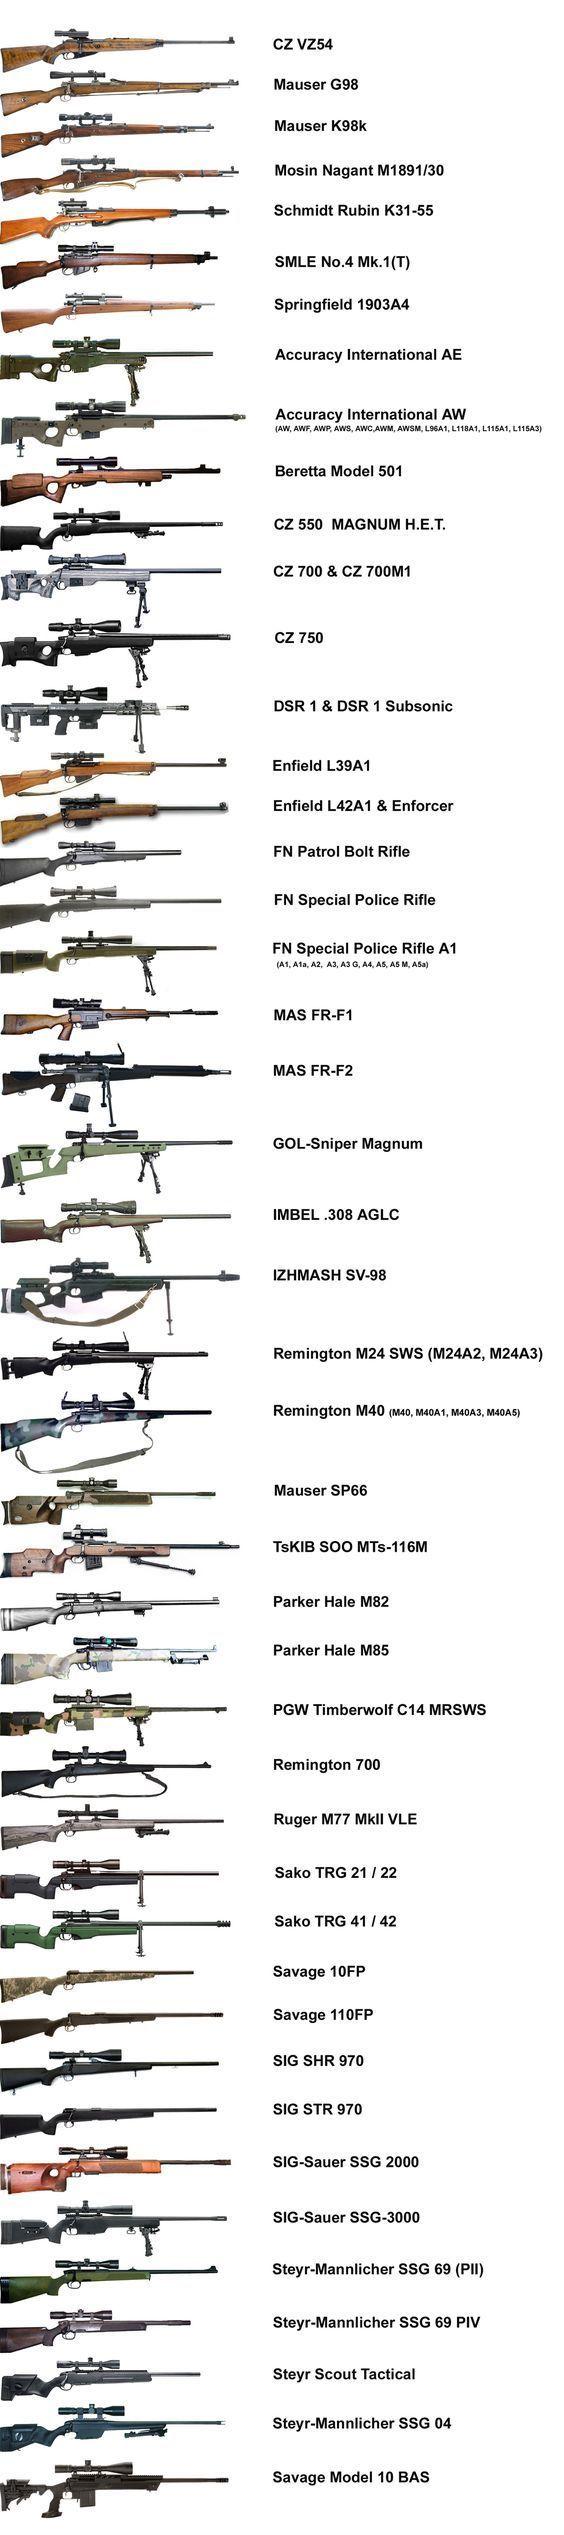 The Chart of Sniper Rifles @aegisgears: